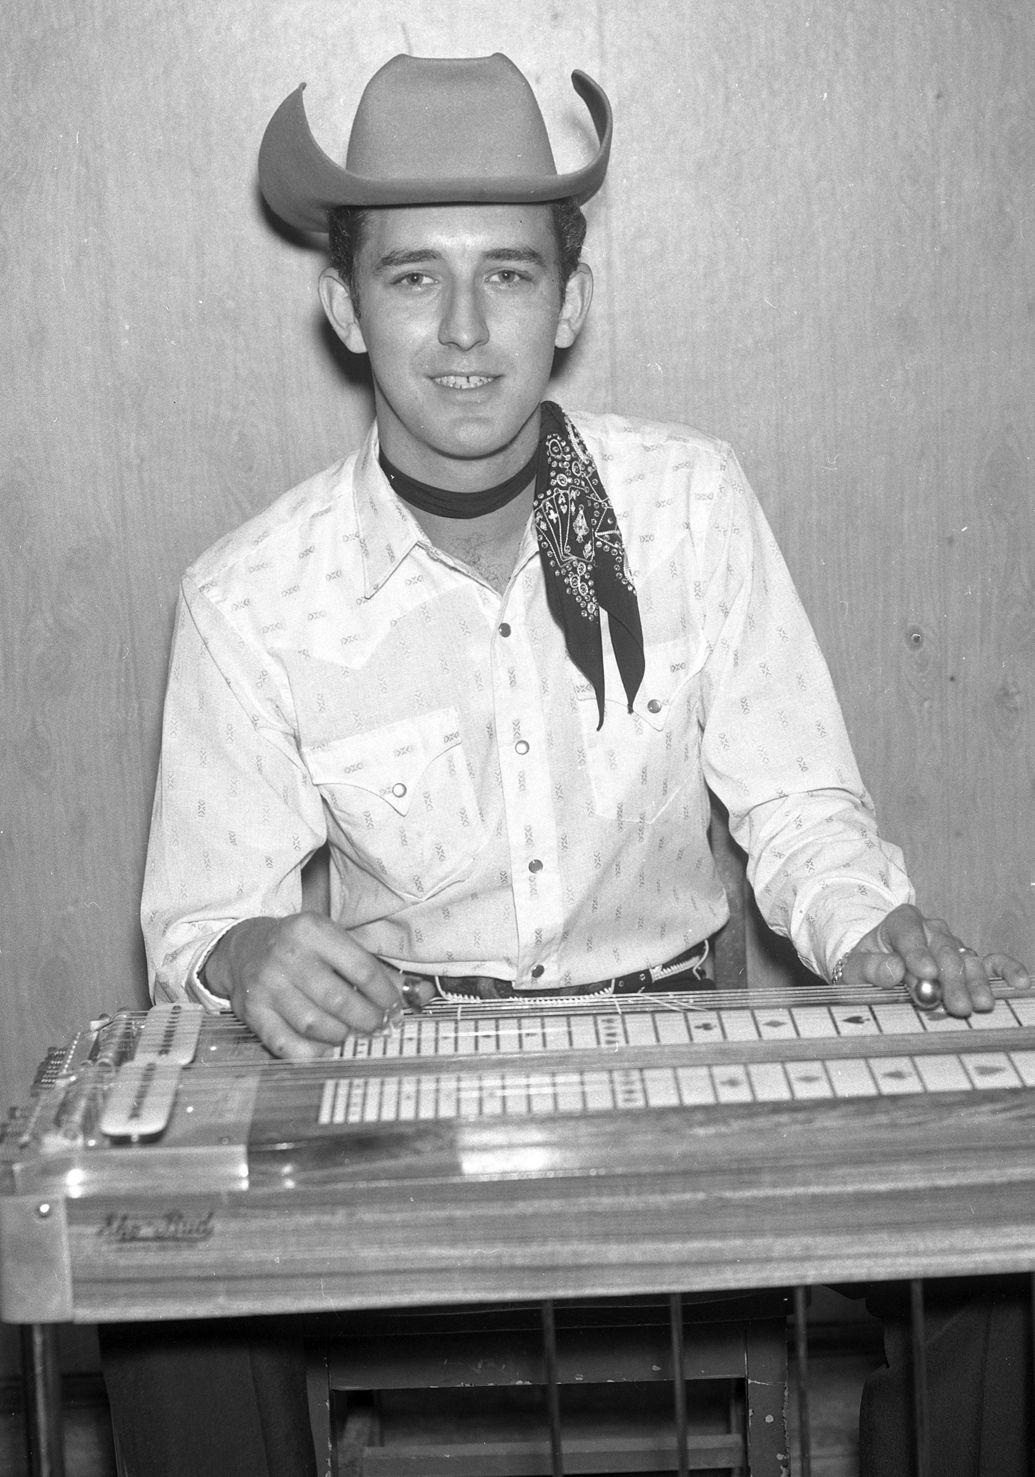 Influential pedal steel guitarist Buddy Emmons dies at 78